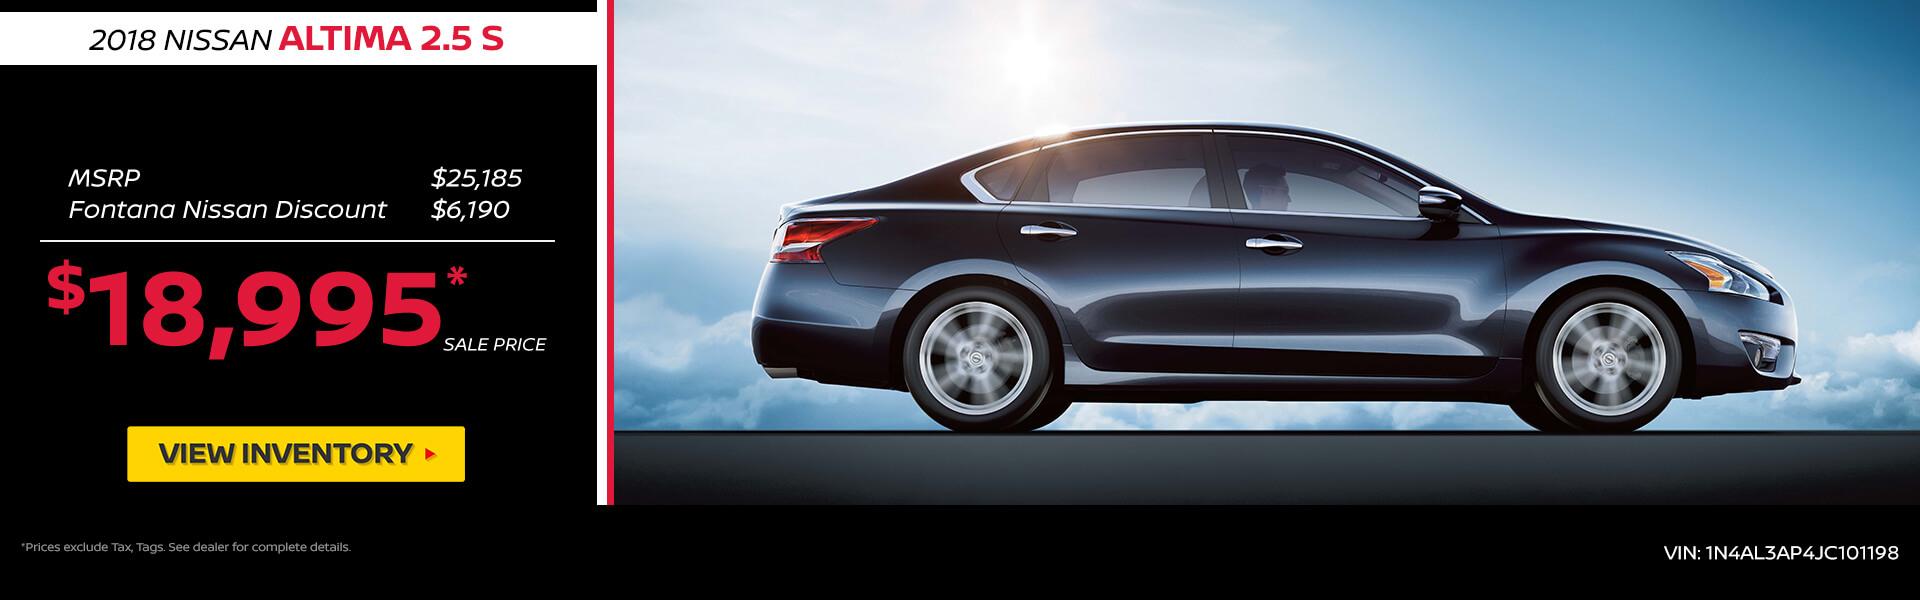 Nissan Altima $18,995 Purchase